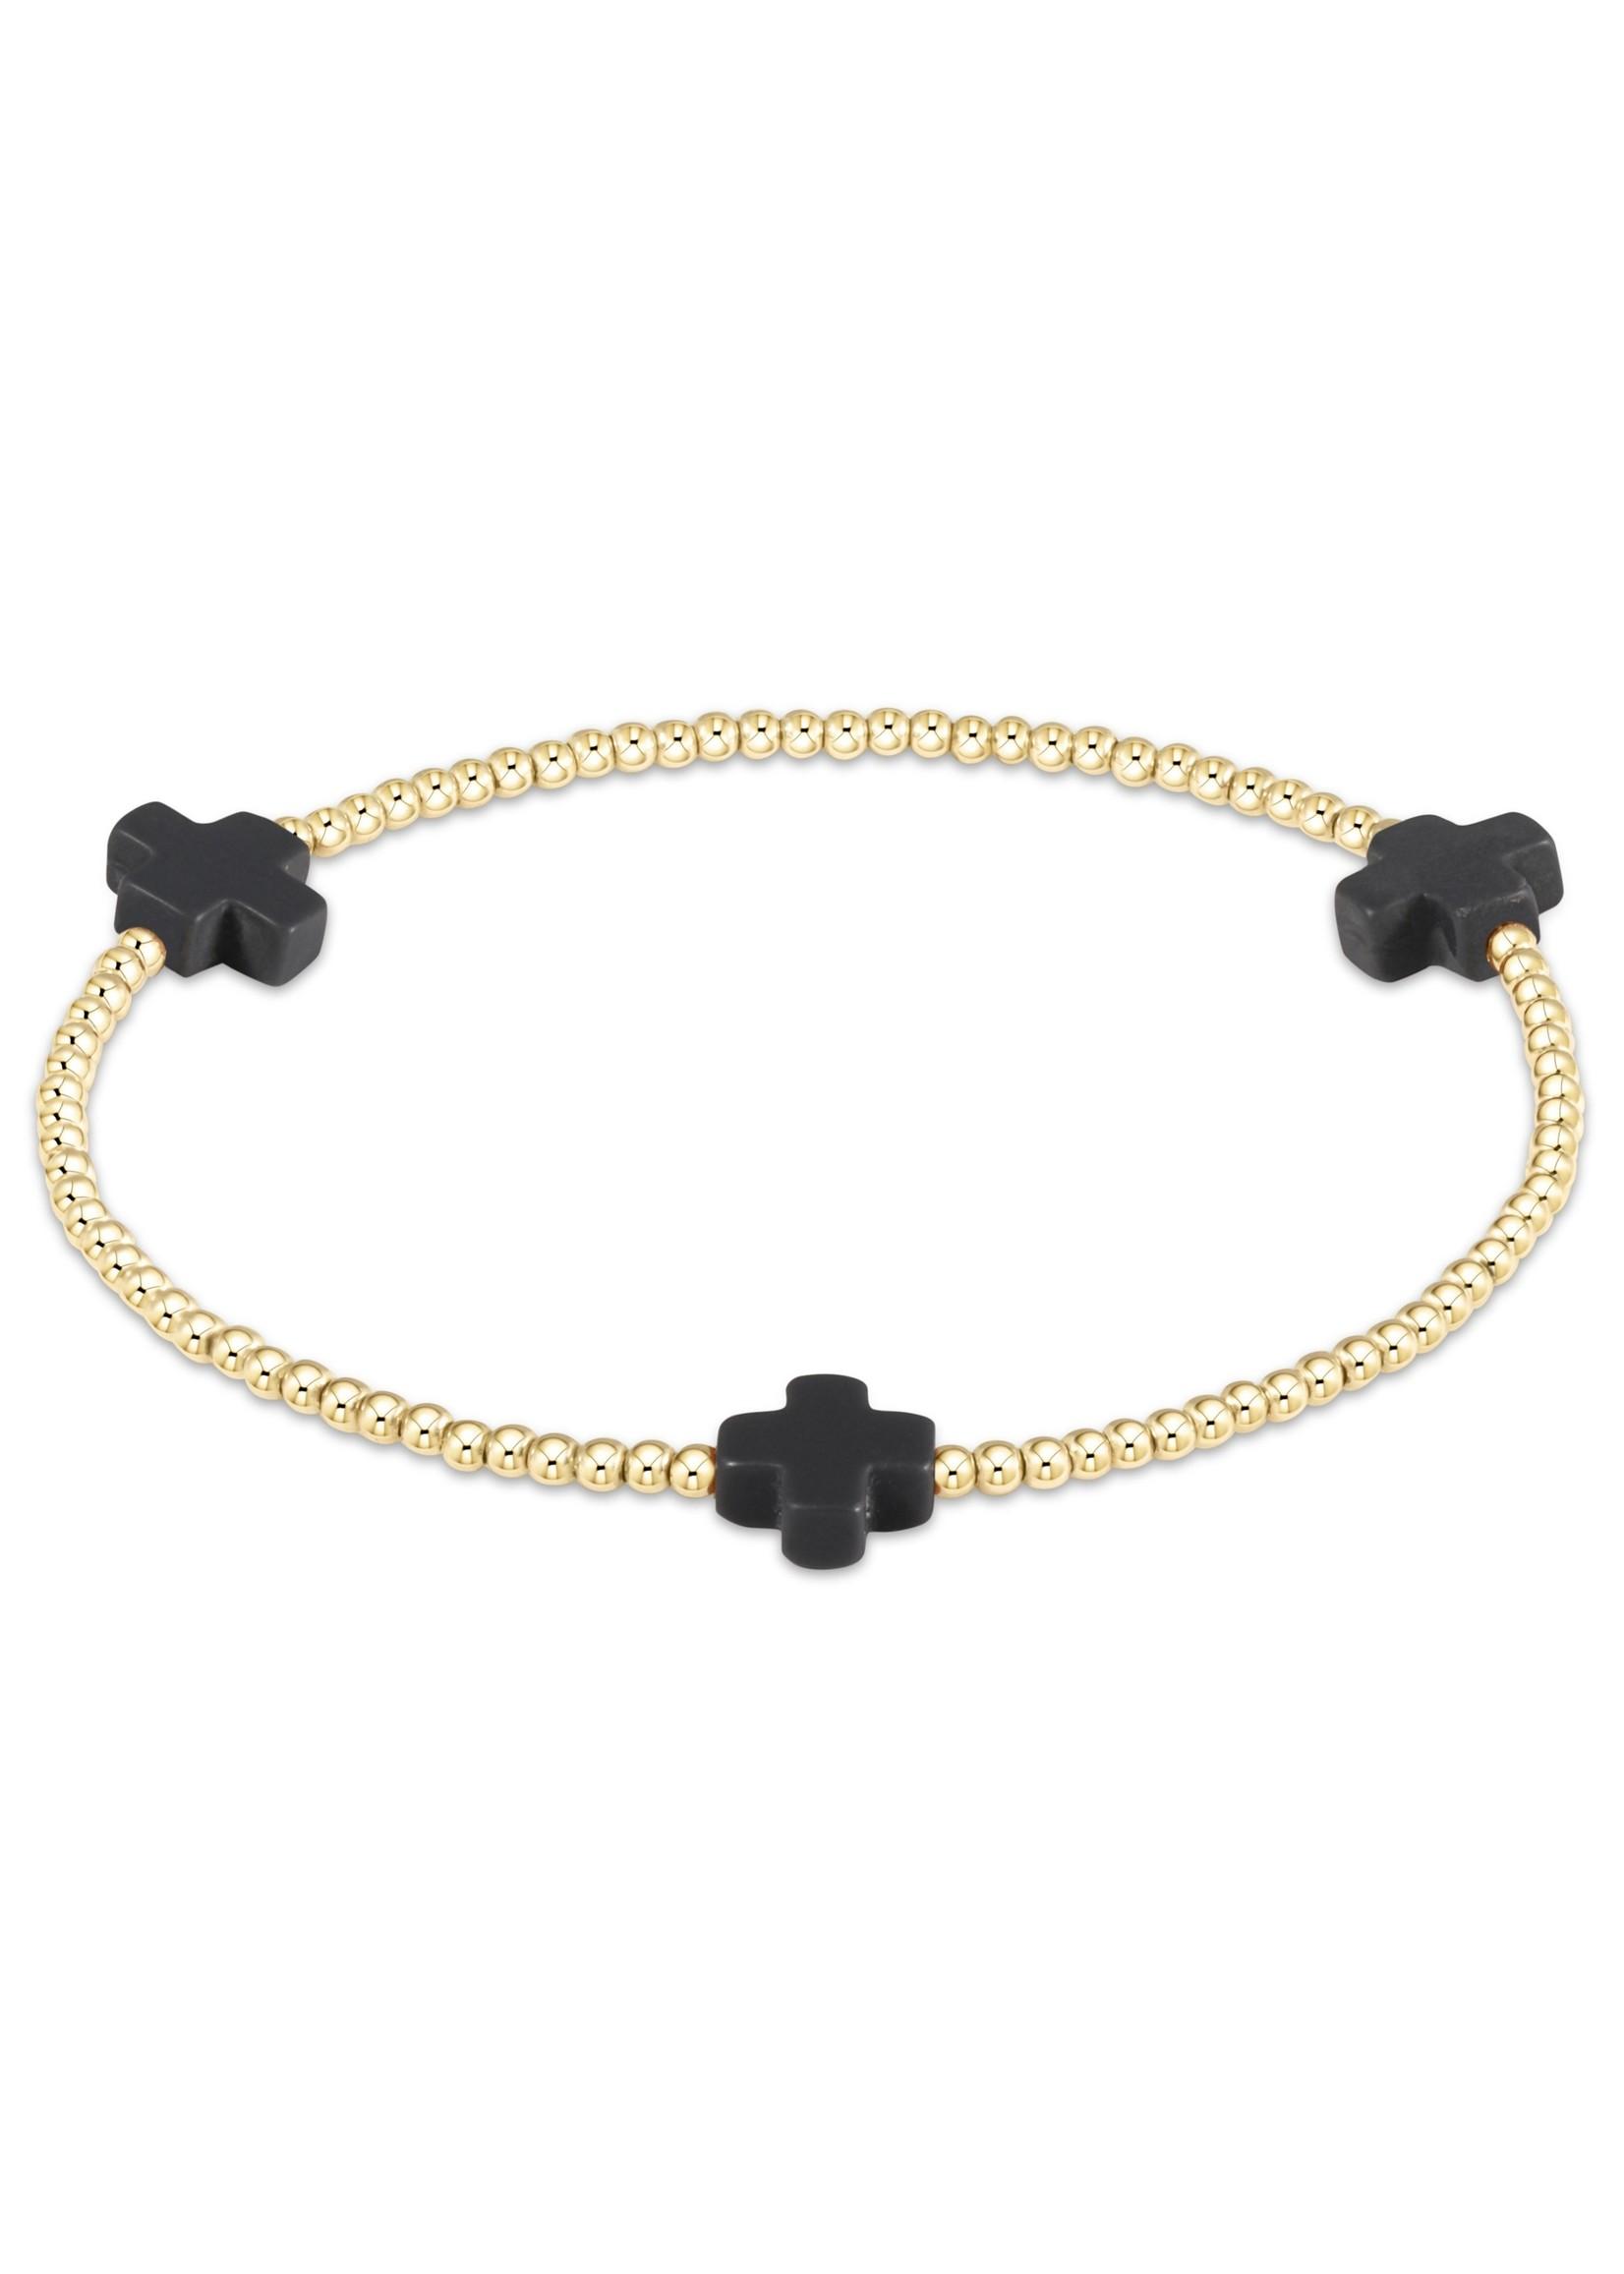 enewton Signature Cross Gold Pattern 3mm Bead Bracelet - Charcoal